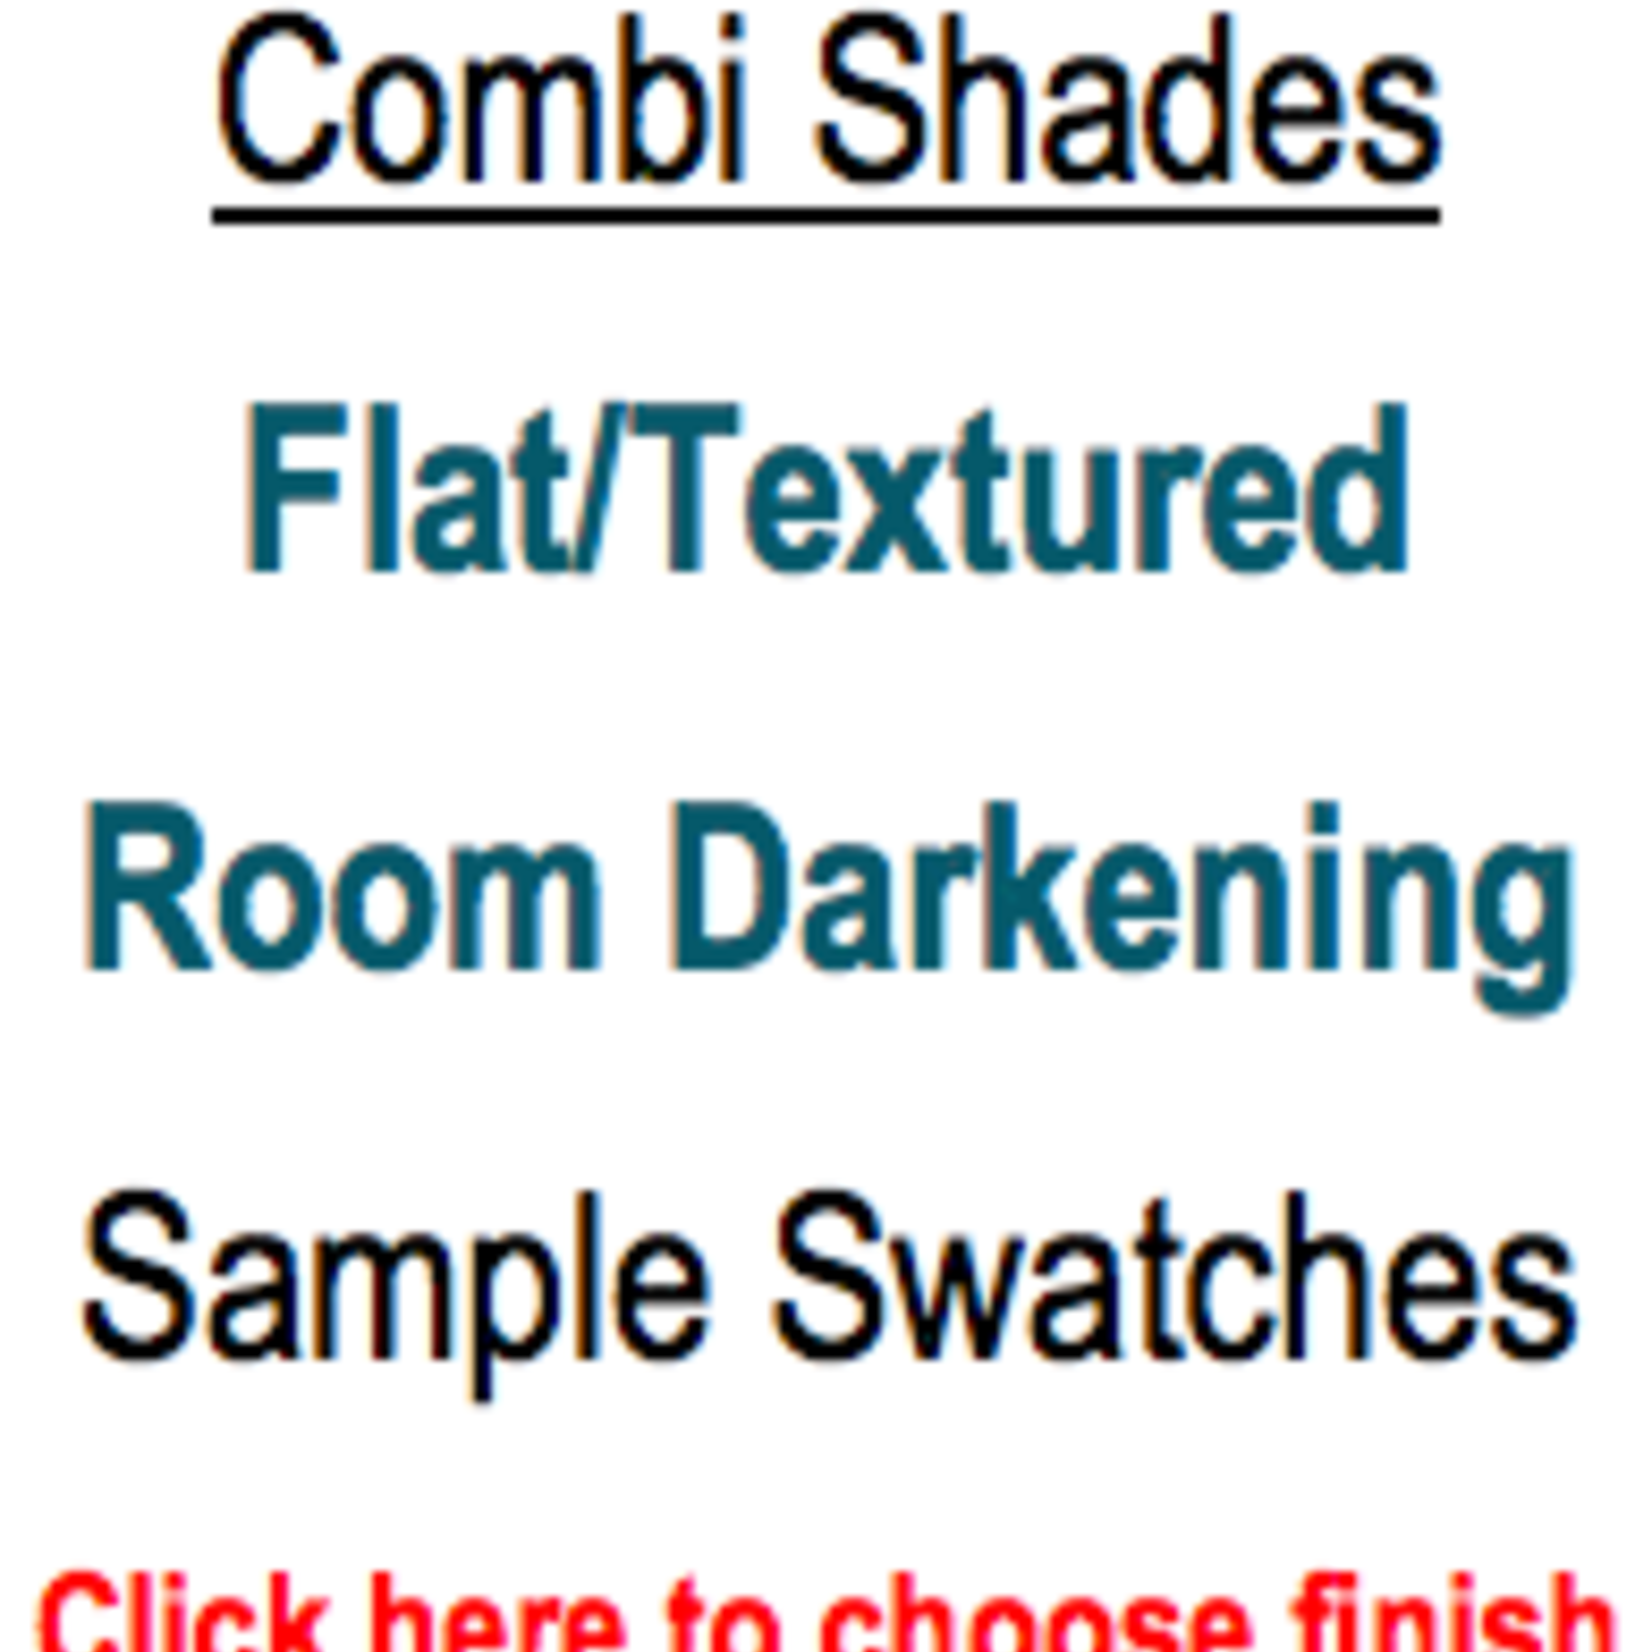 Trendy Blinds Combi Shade - Flat/Textured Room Darkening Sample Swatch